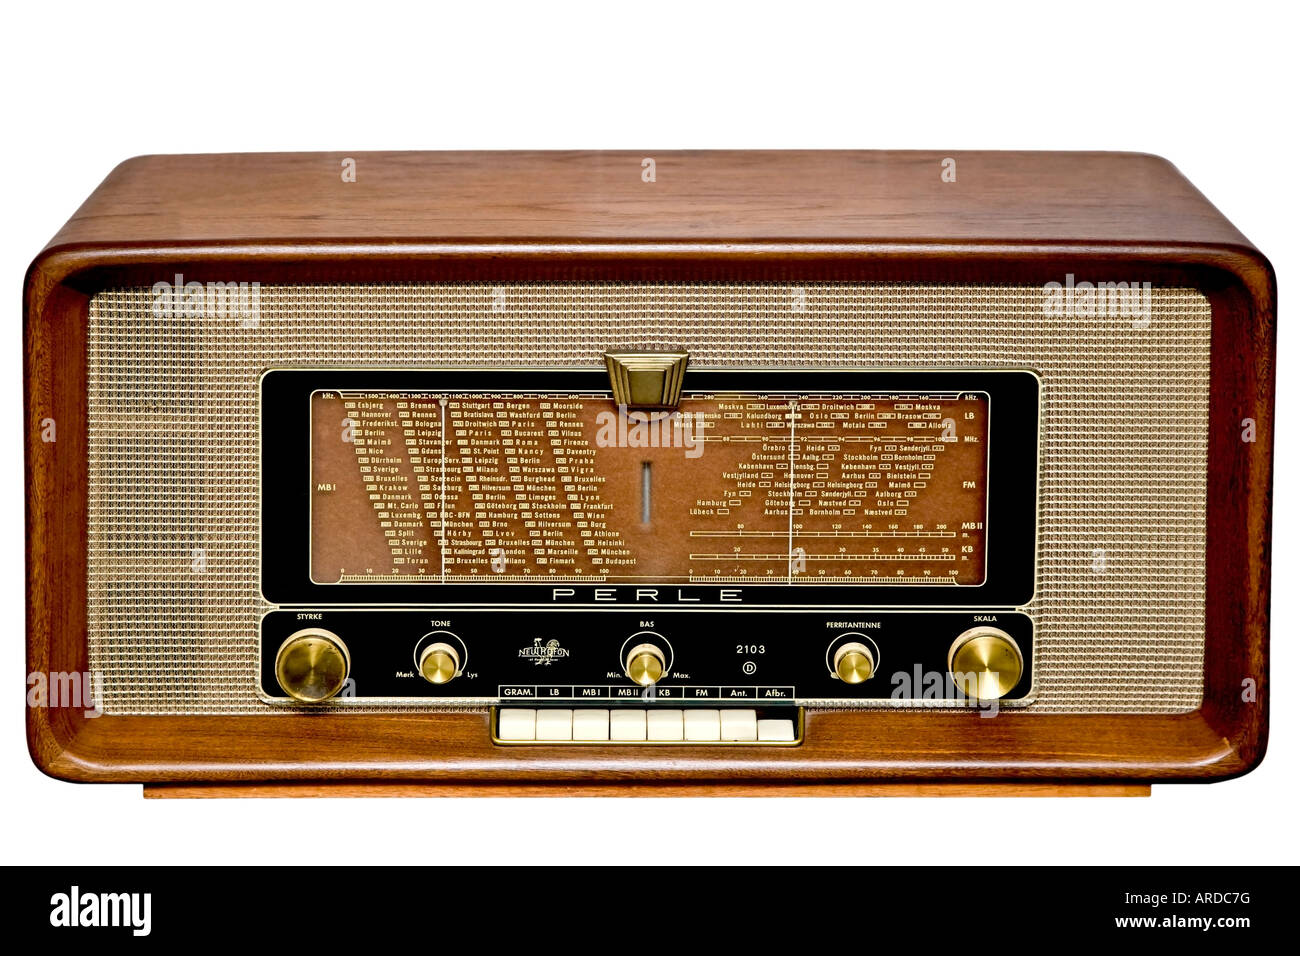 Old radio - Stock Image